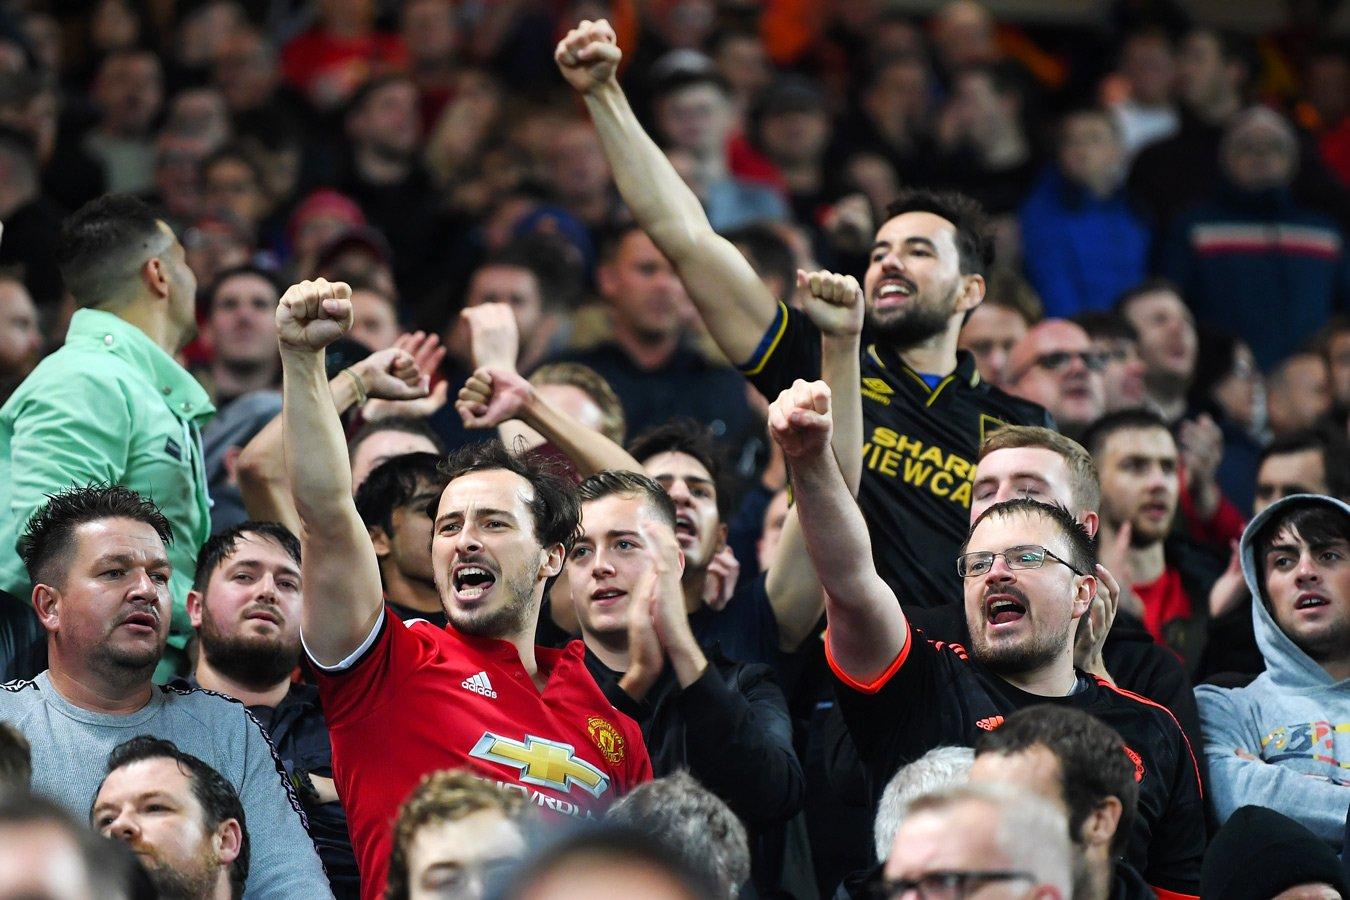 Тысячи фанатов «Манчестер Юнайтед» протестуют против владельцев клуба. Видео